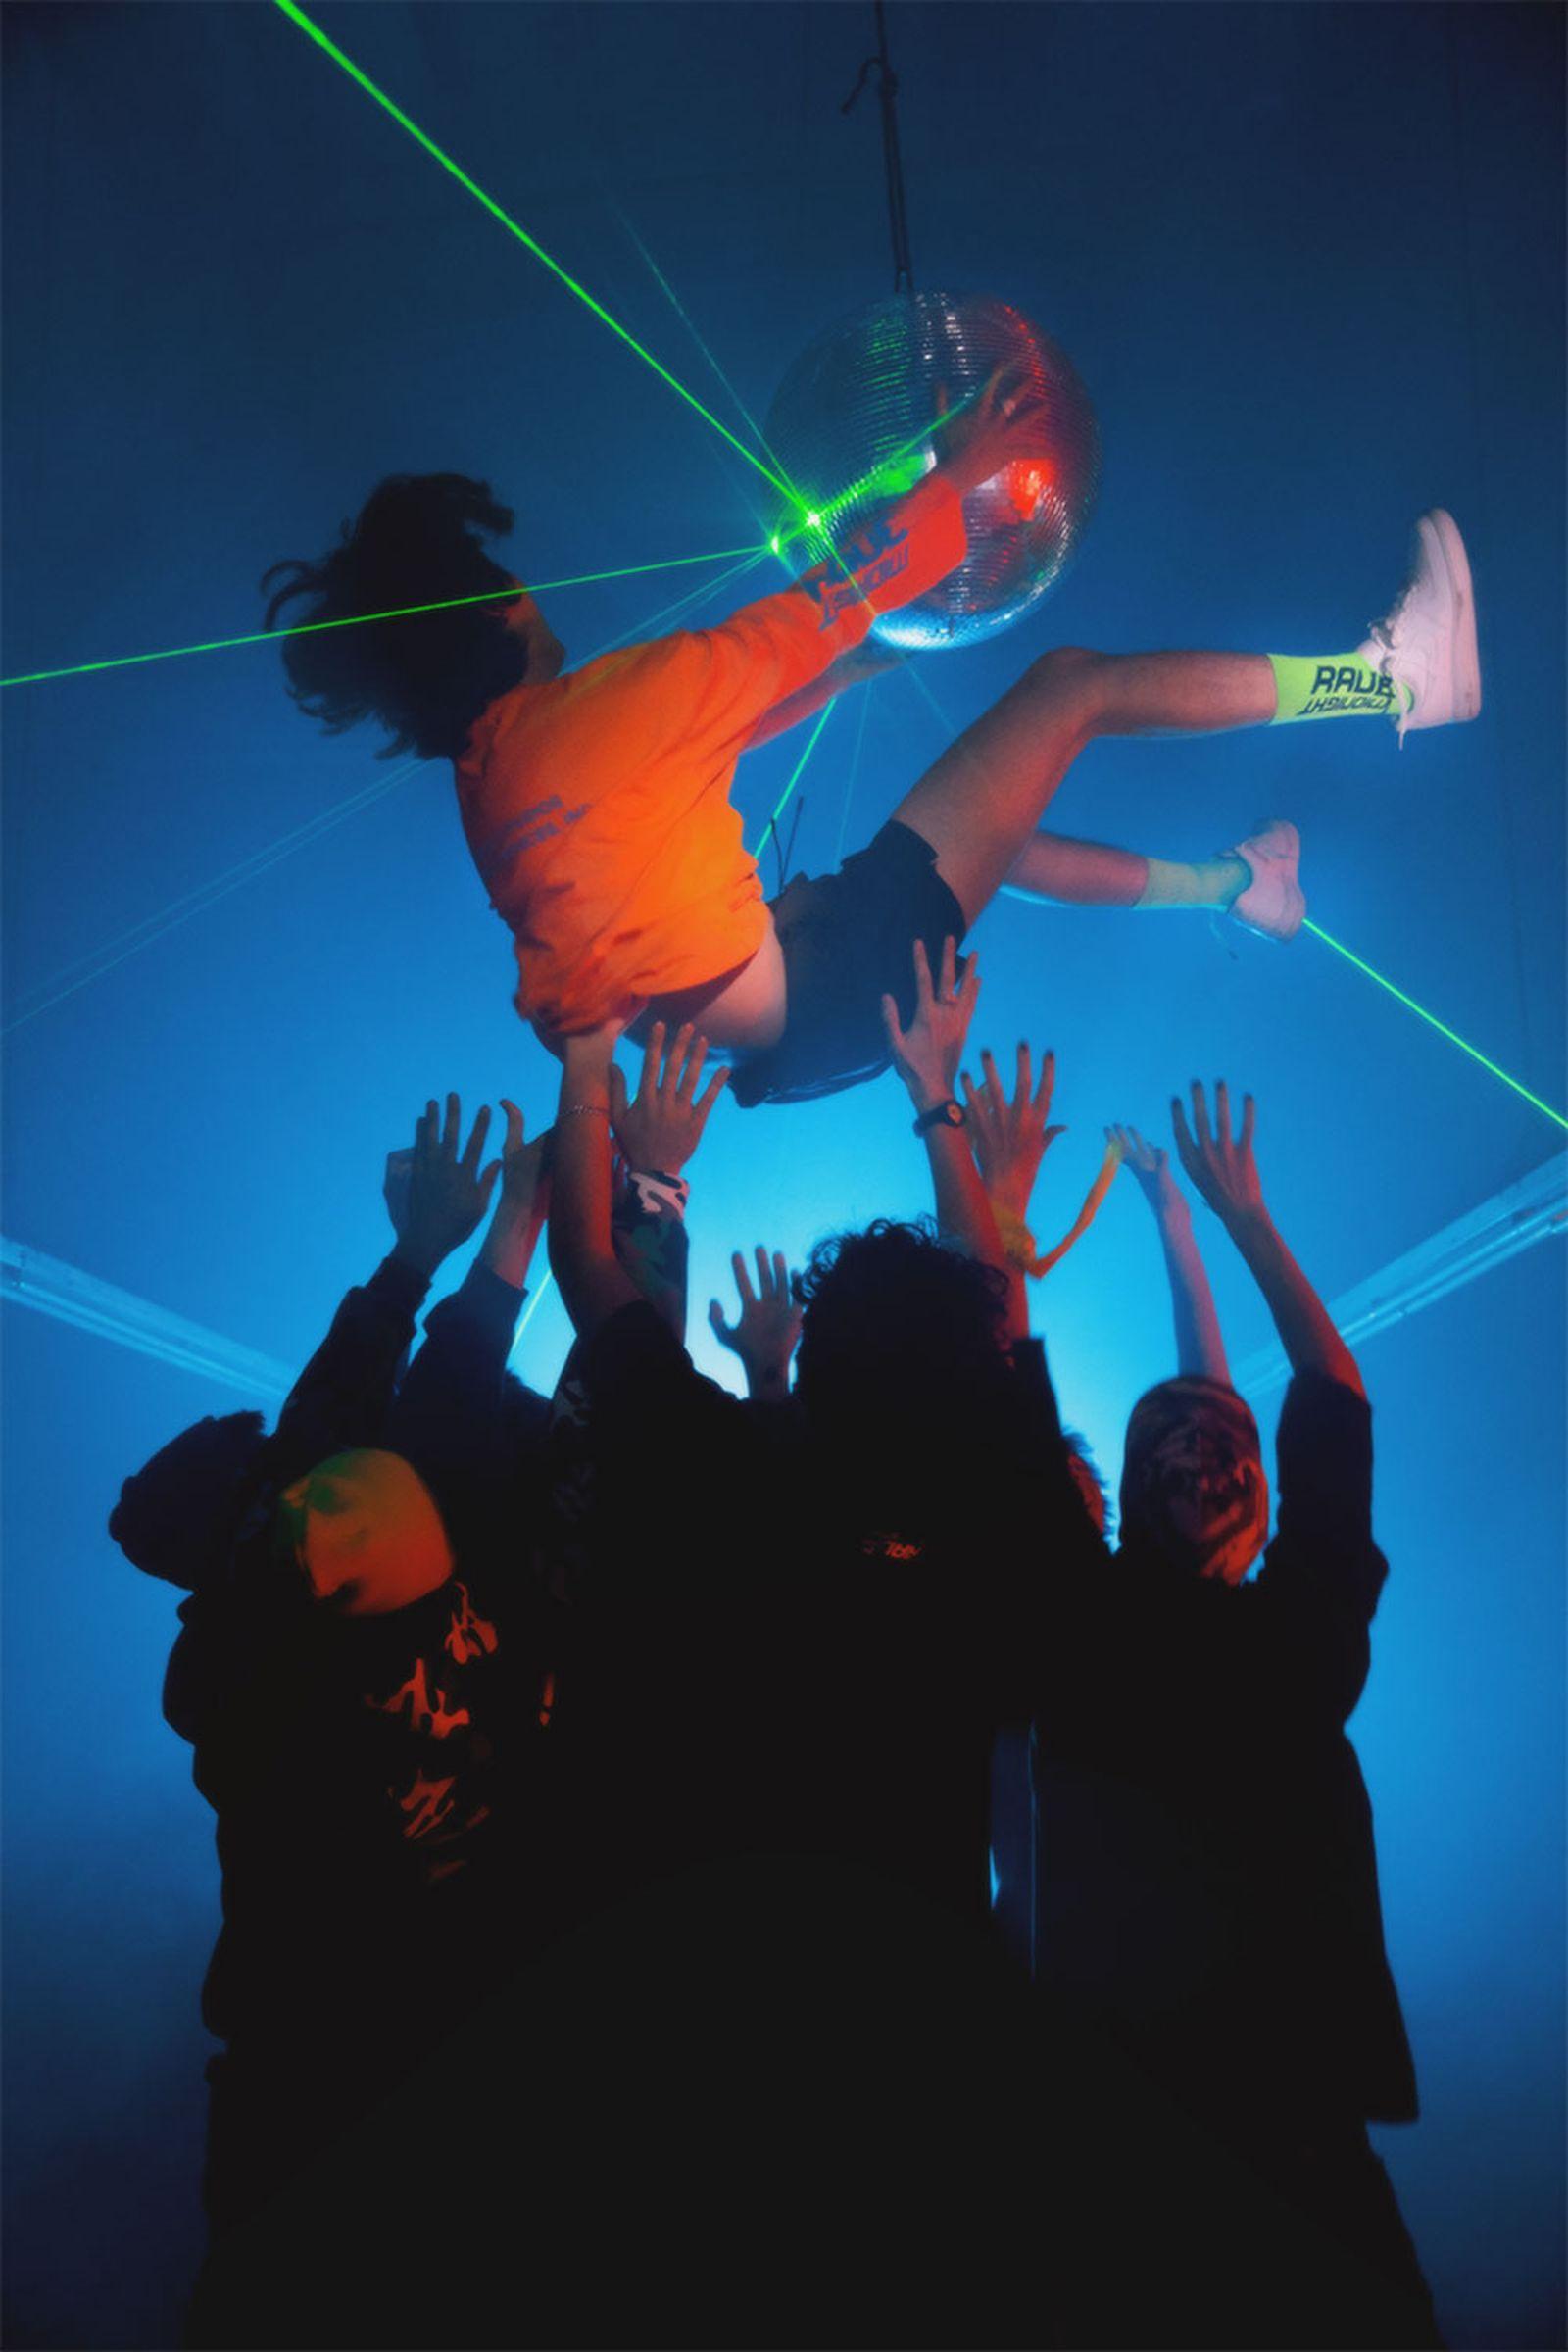 asap rocky awge midnight studios 90s midnight rave lookbook A$AP Rocky